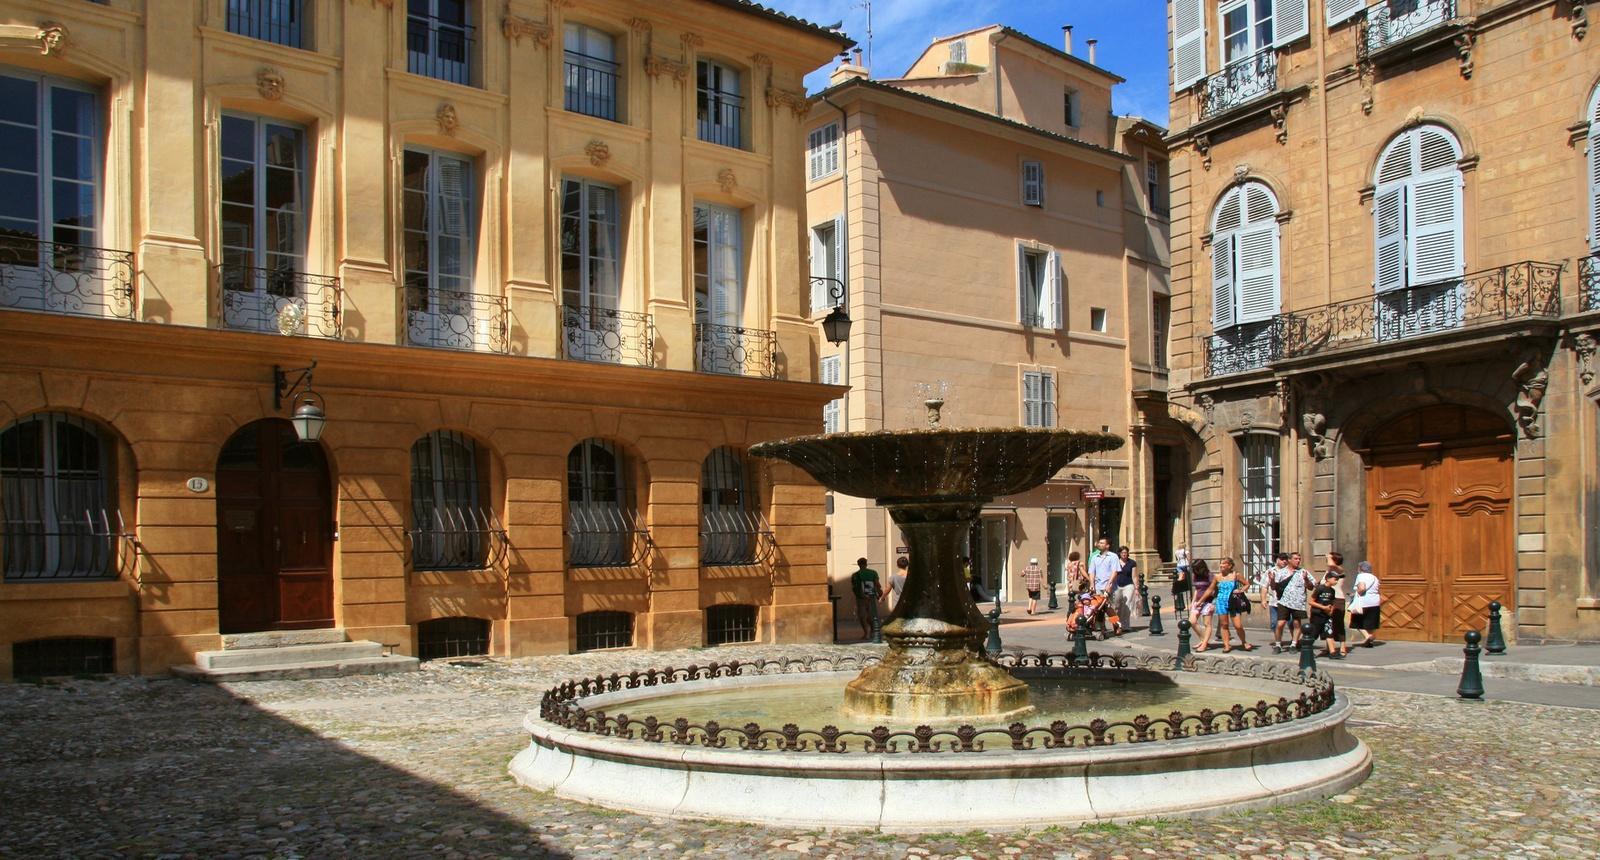 54294_1_aix-en-provence-place-albertas.jpg